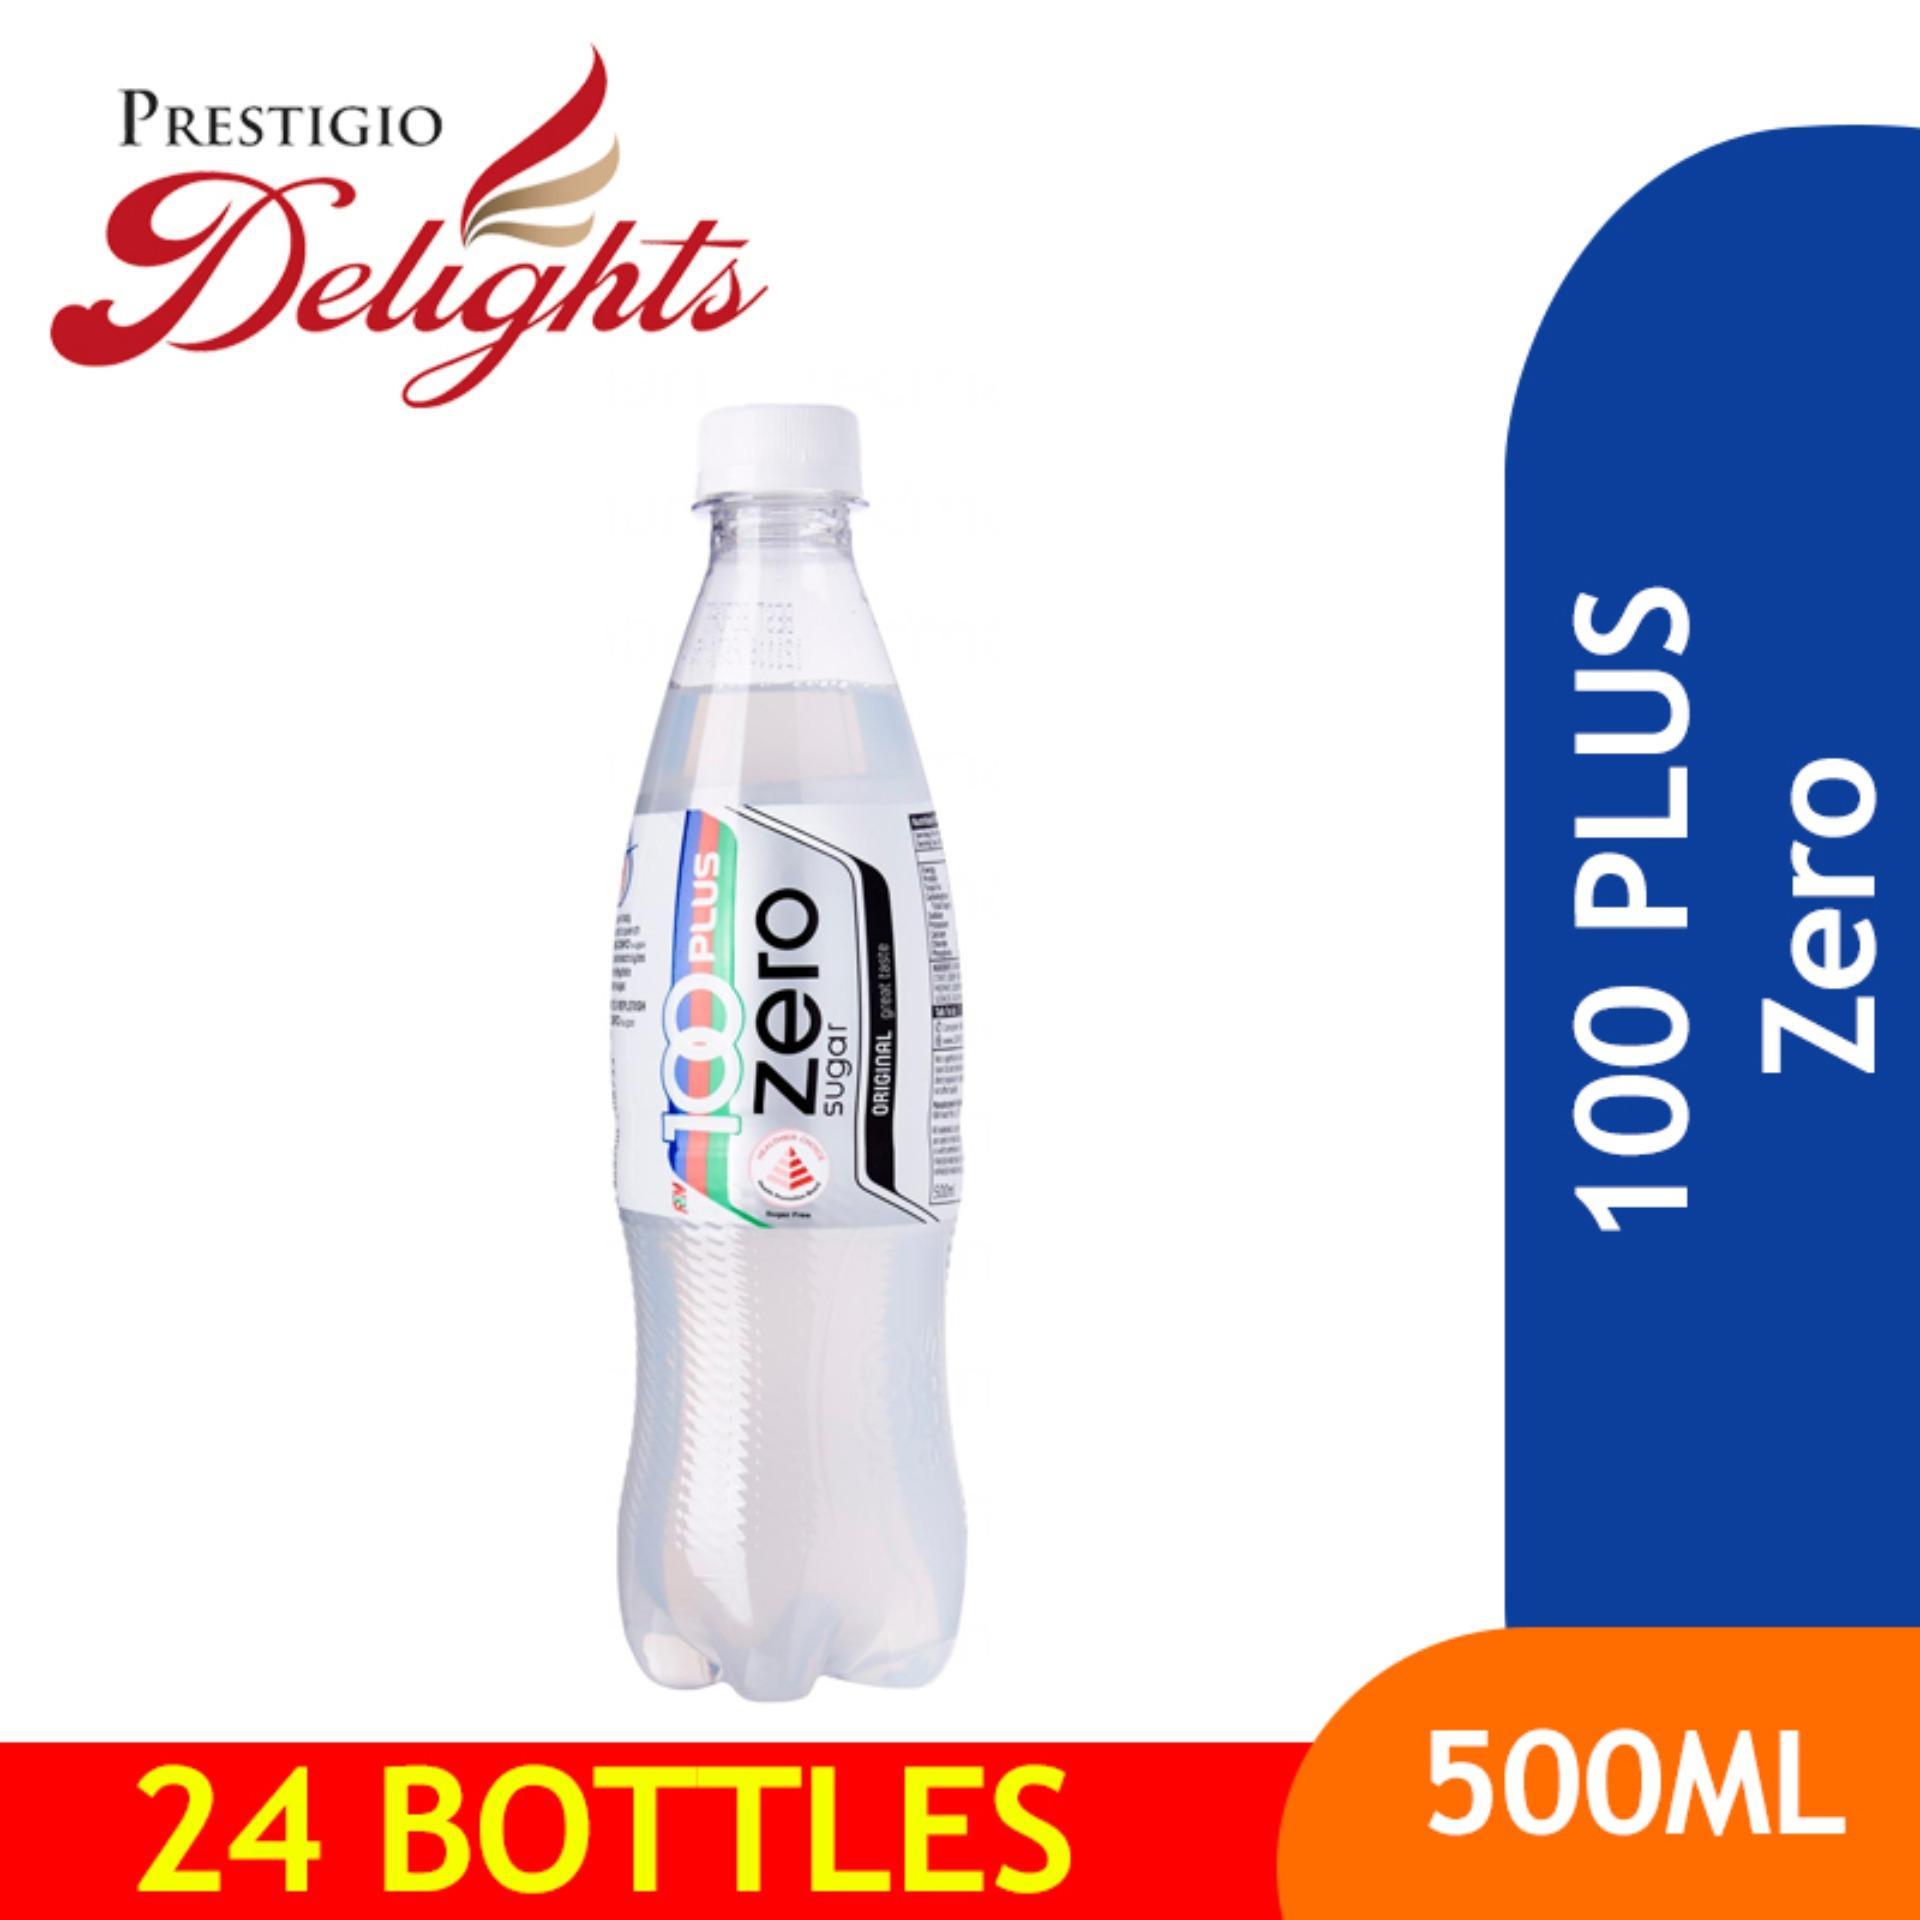 100 Plus Zero 500ml Bundle Of 24 By Prestigio Delights.